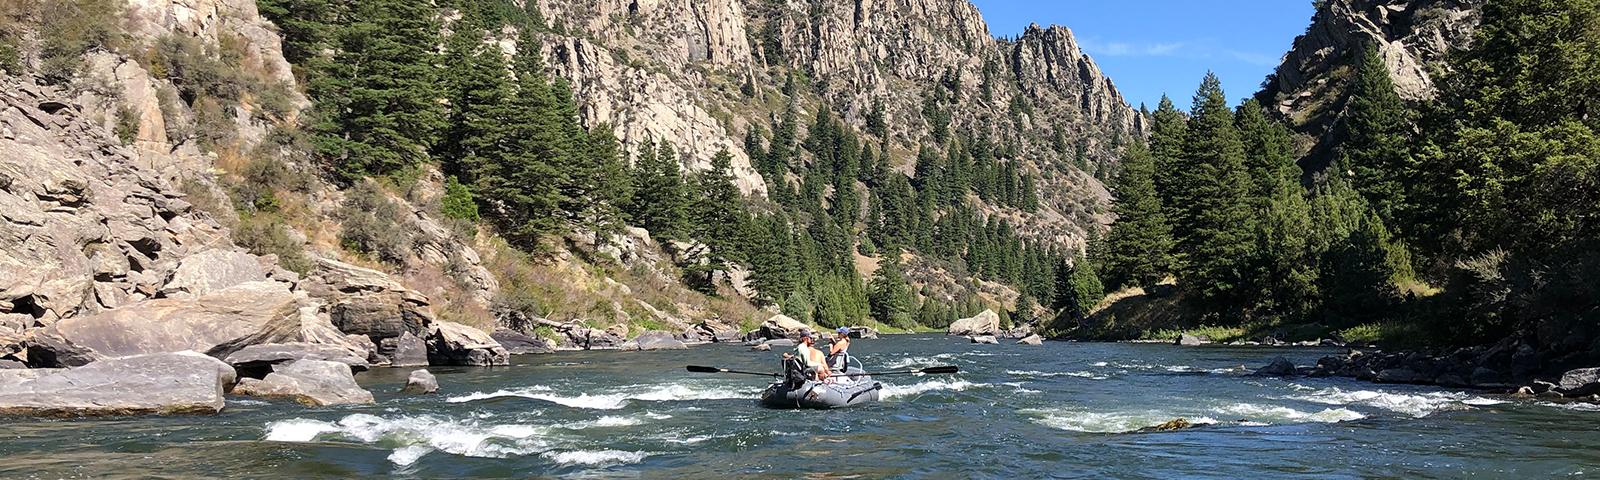 rafting-montana copy